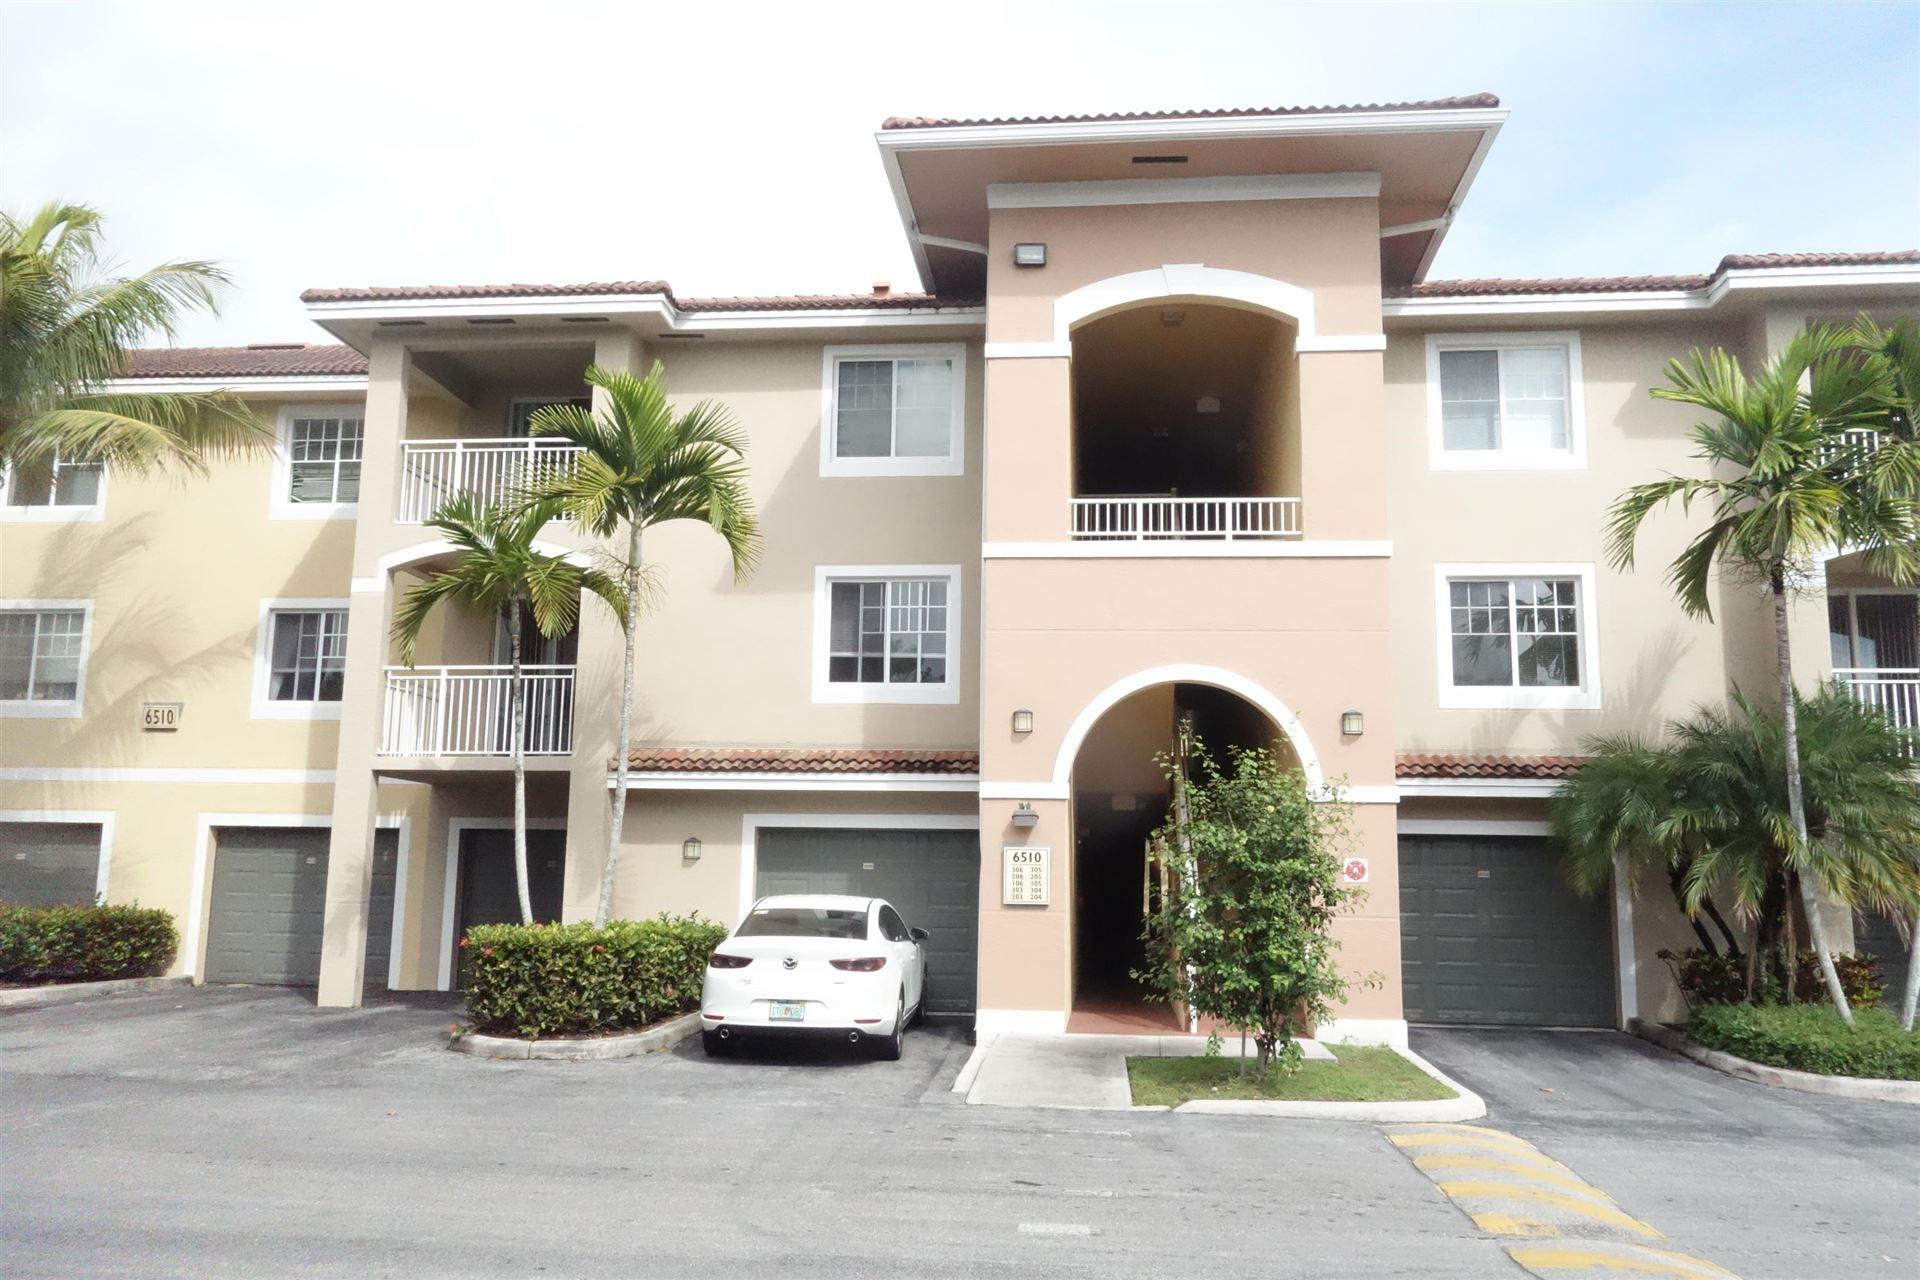 6510 Emerald Dunes Drive #206, West Palm Beach, FL 33411 - #: RX-10595838